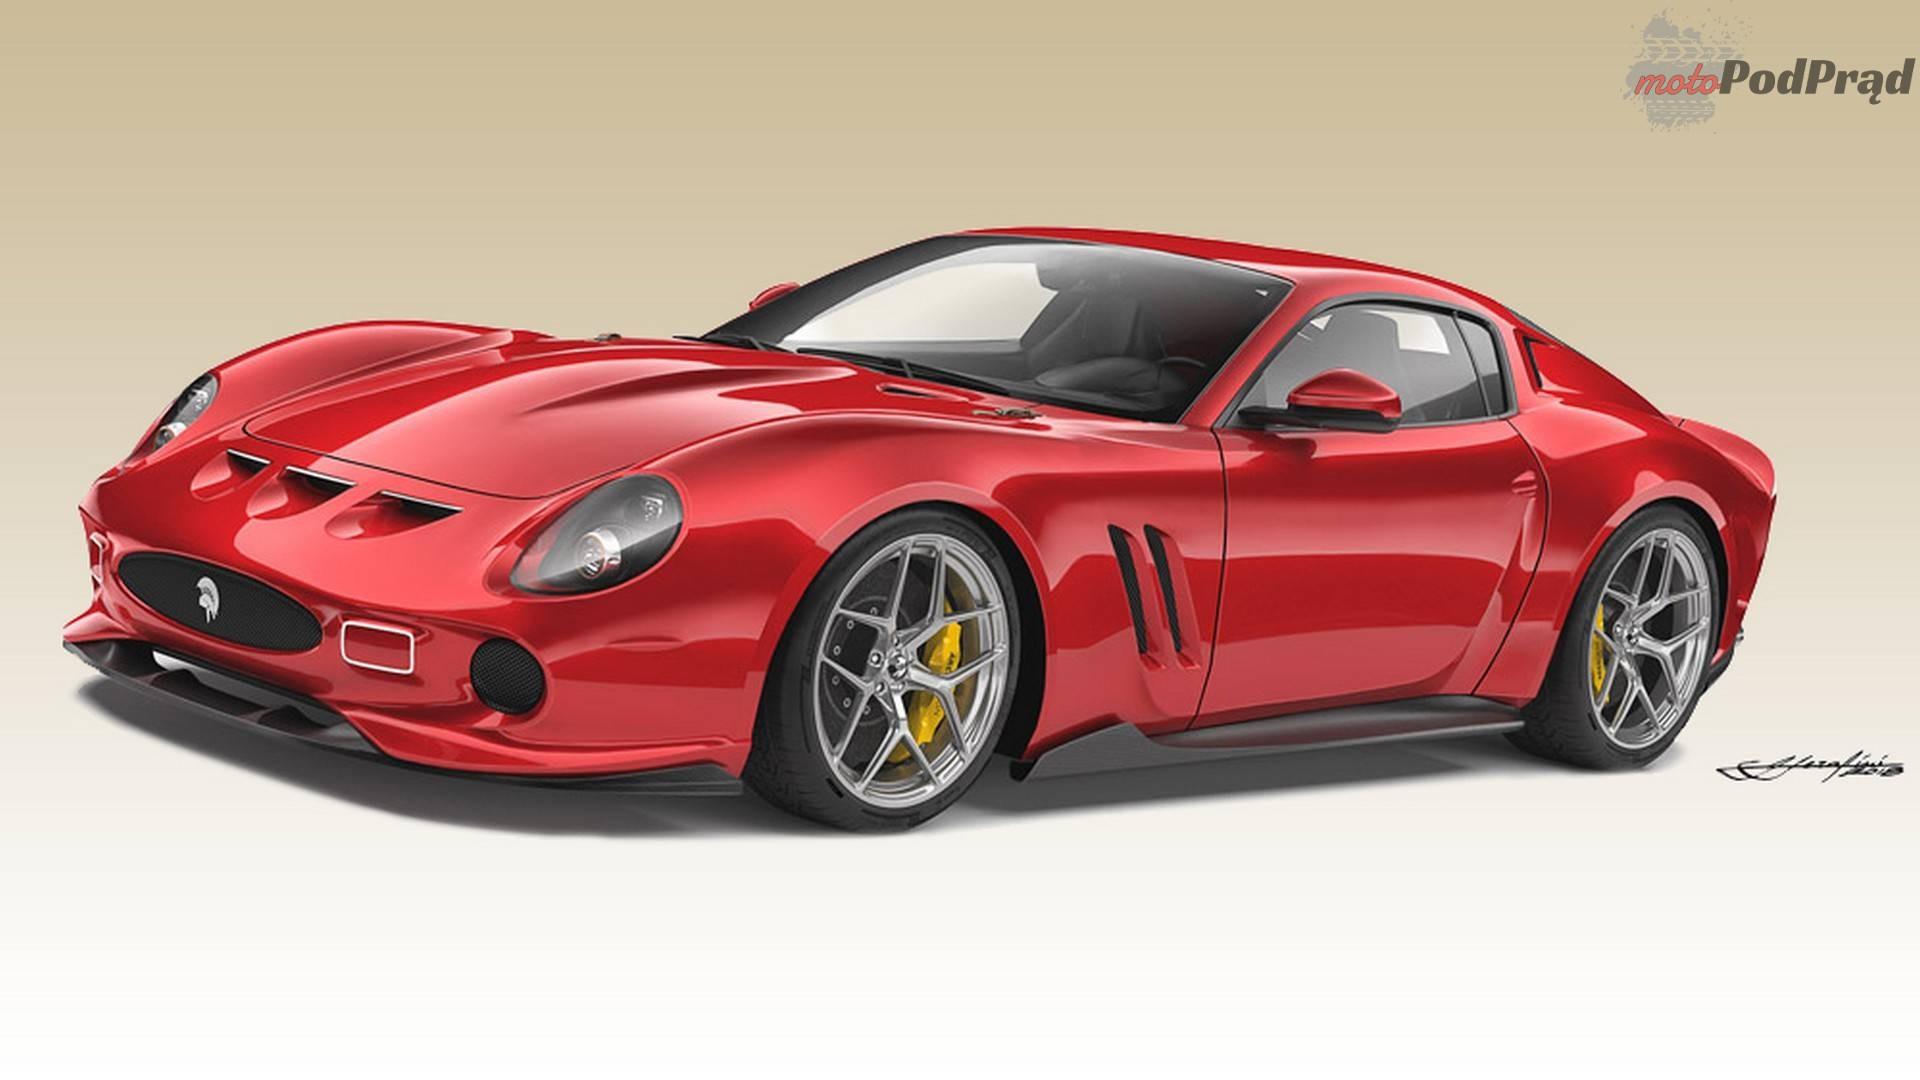 ferrari 812 superfast based 250 gto by ares design Reiknarnacja GTO, której Ferrari nie stworzyło